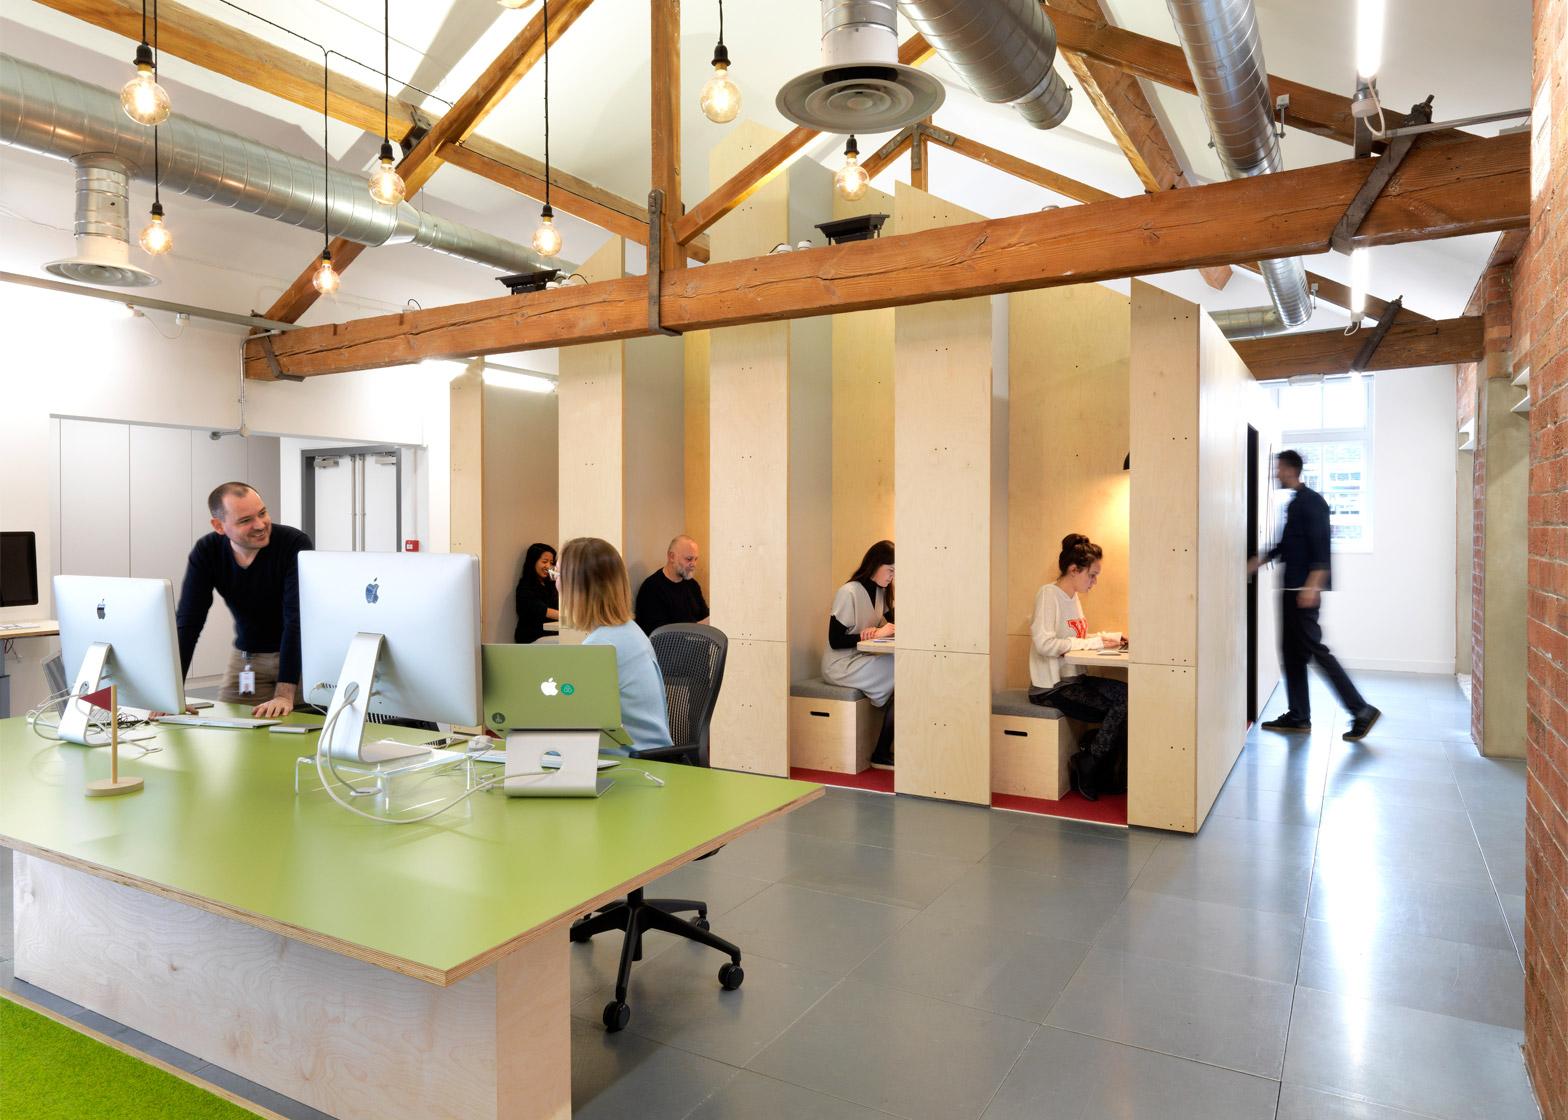 airbnb-office_london_threefold_dezeen_1568_4